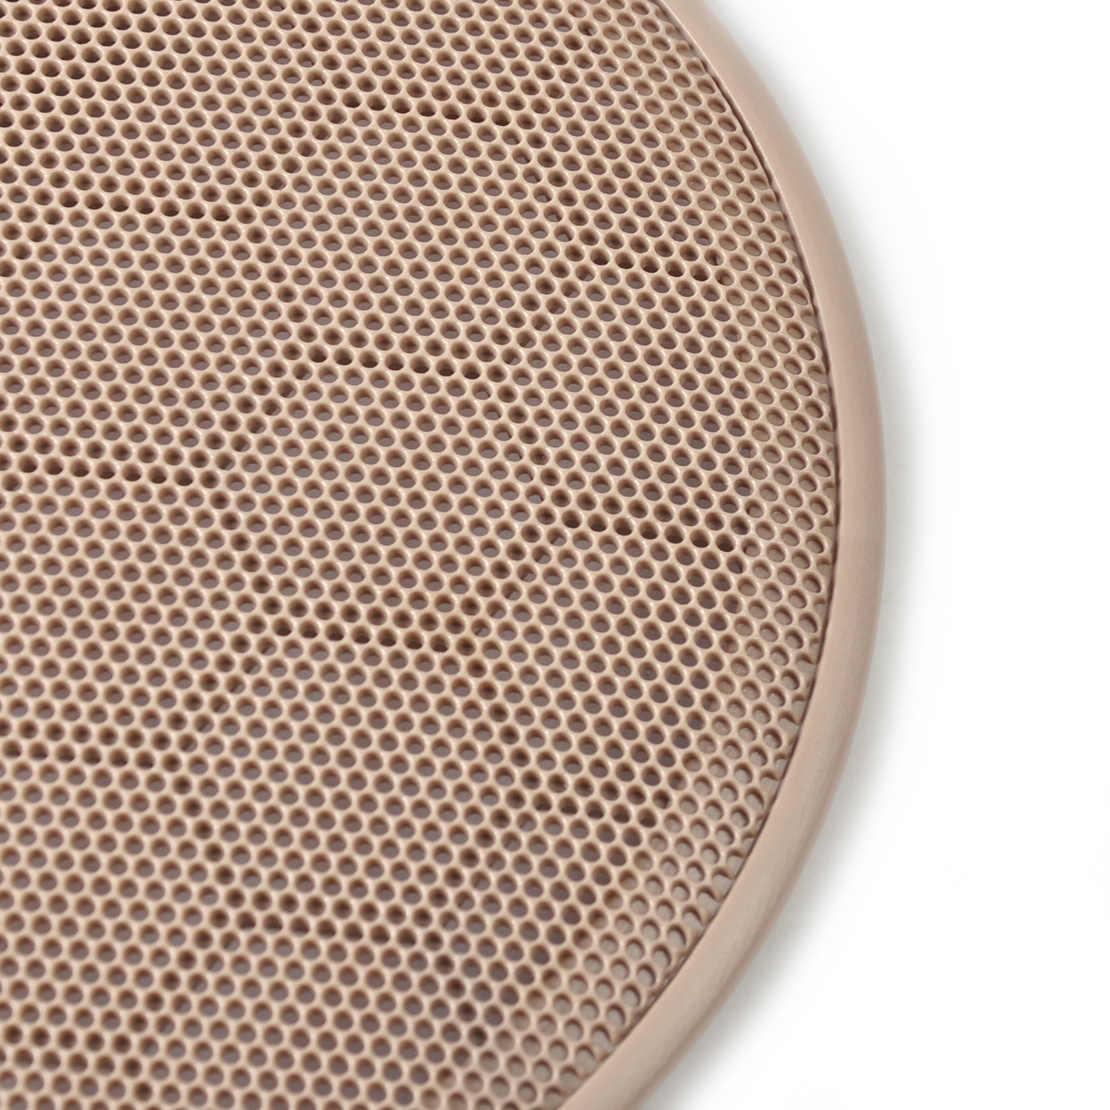 medium resolution of  dwcx 2pcs door loud speaker cover grill 3b0868149 for volkswagen passat b5 jetta mk4 golf gti